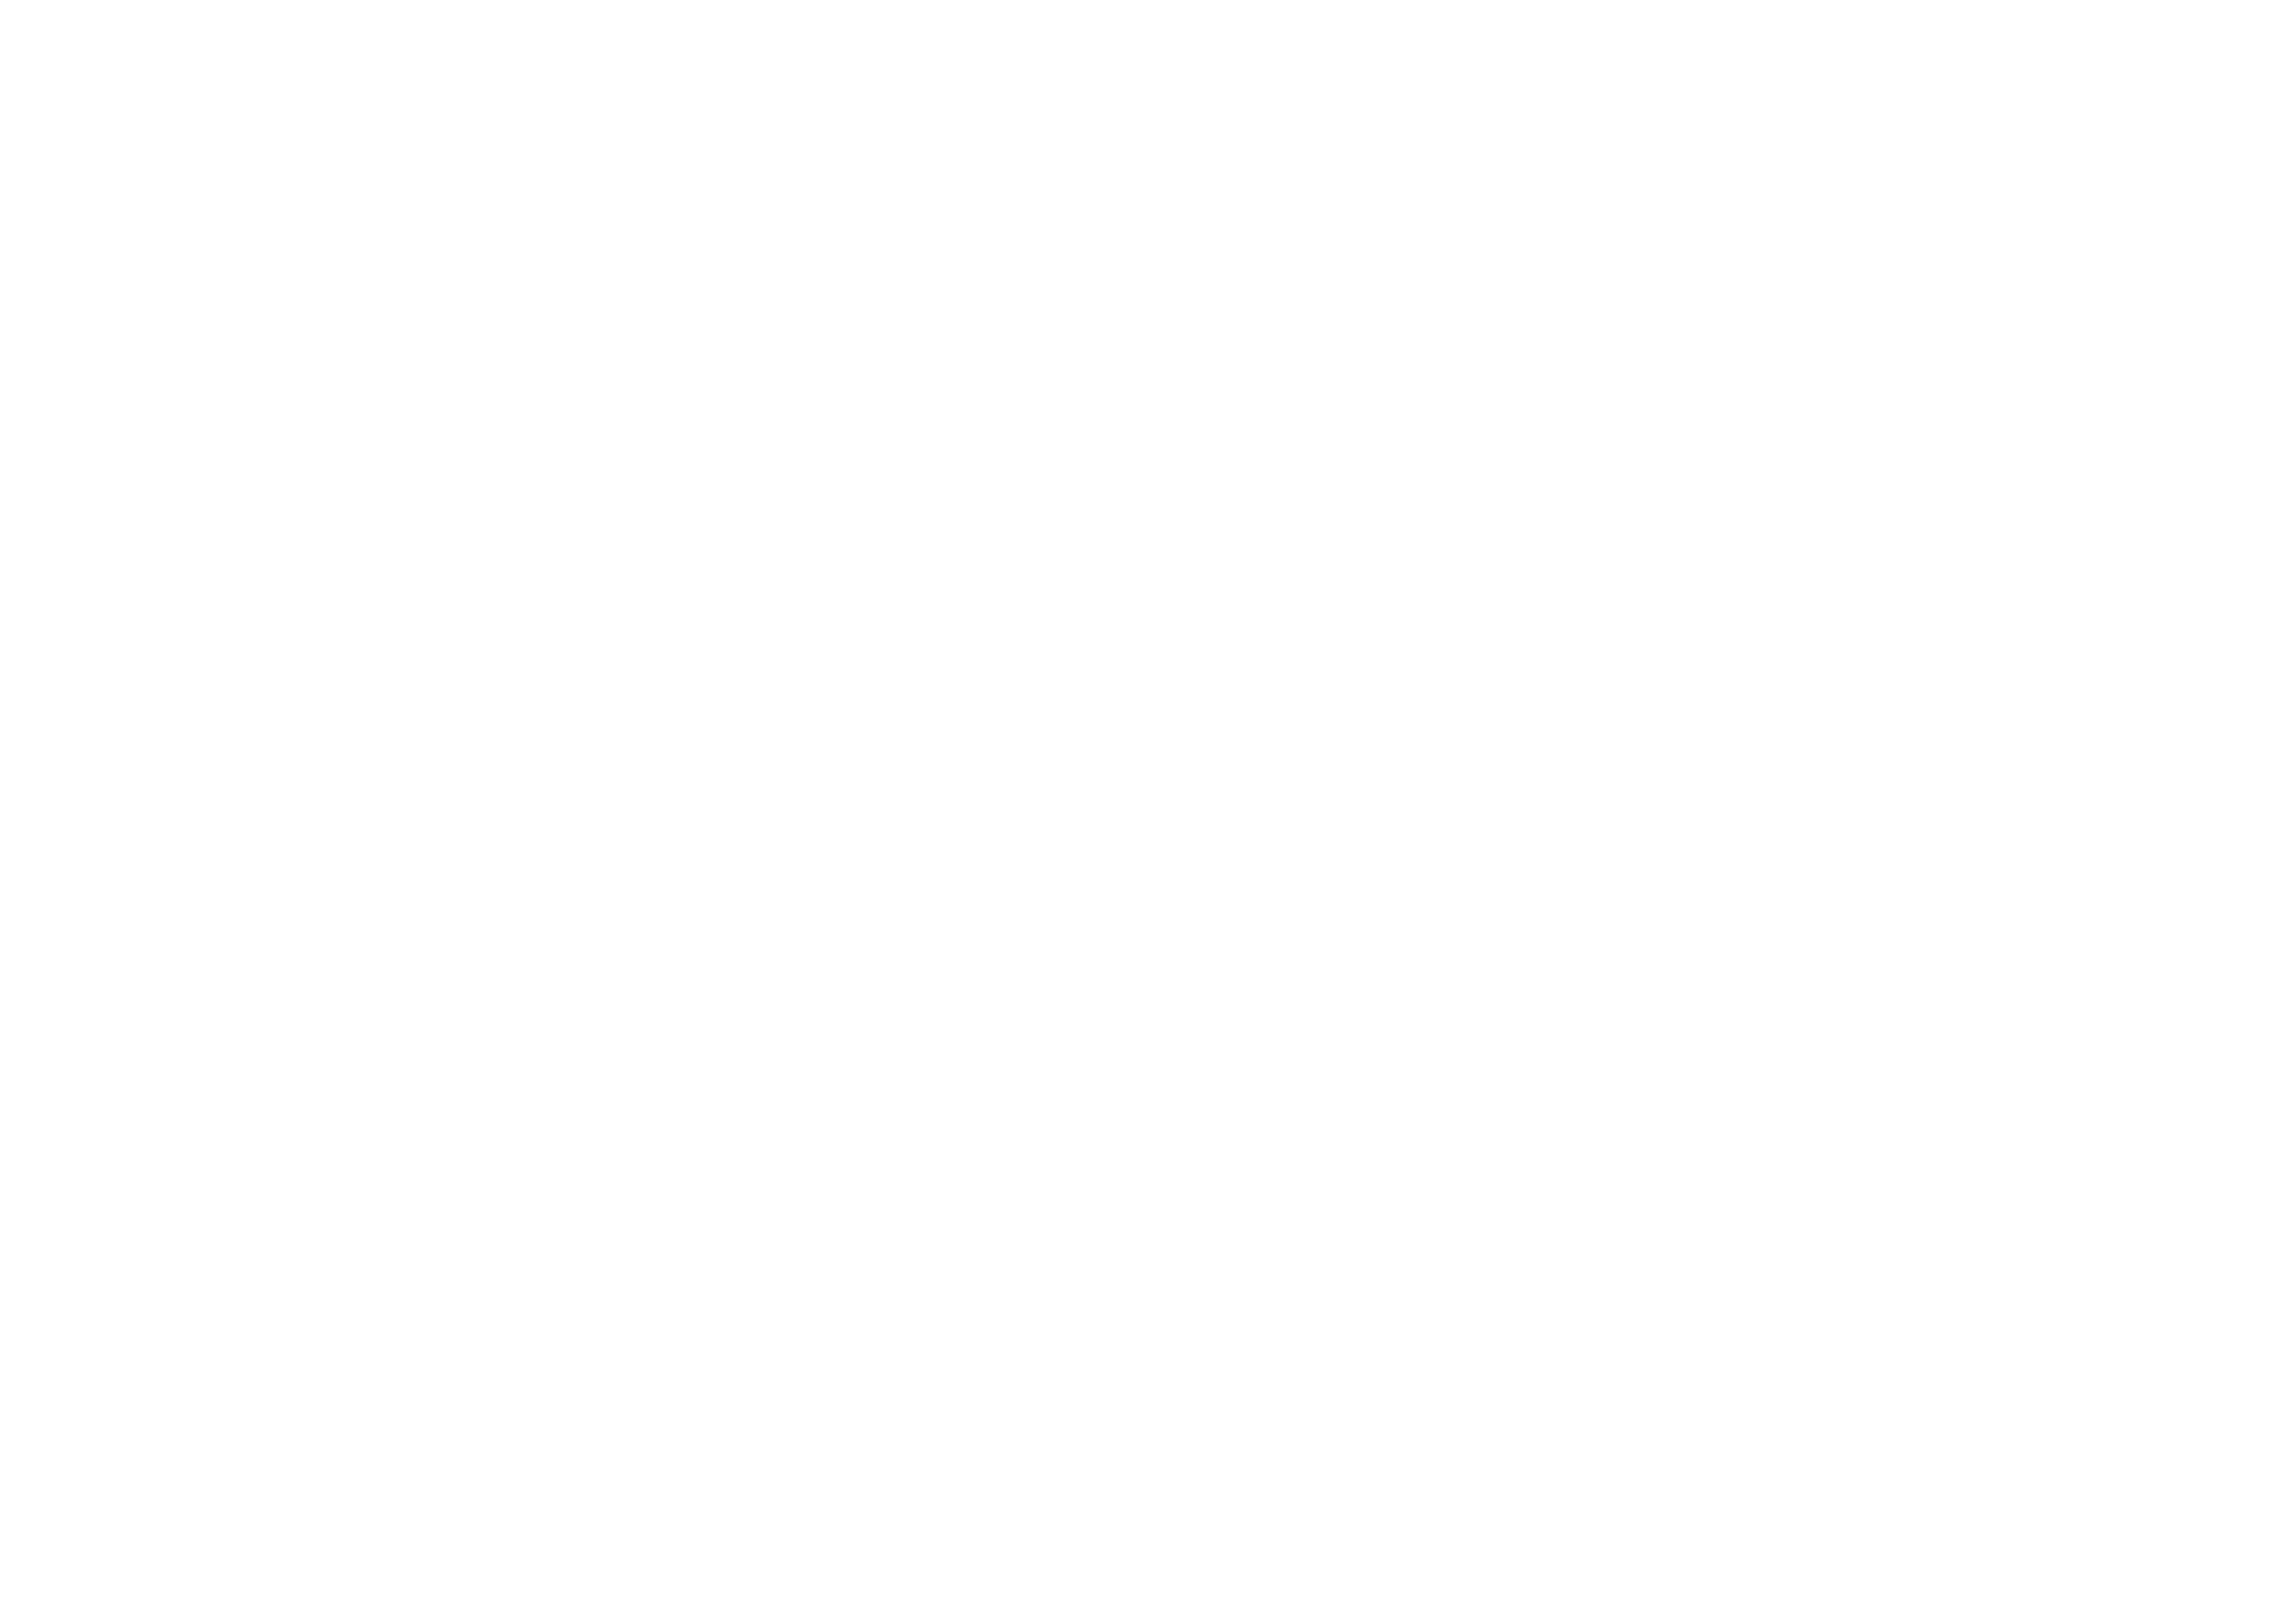 AIr France - KLM